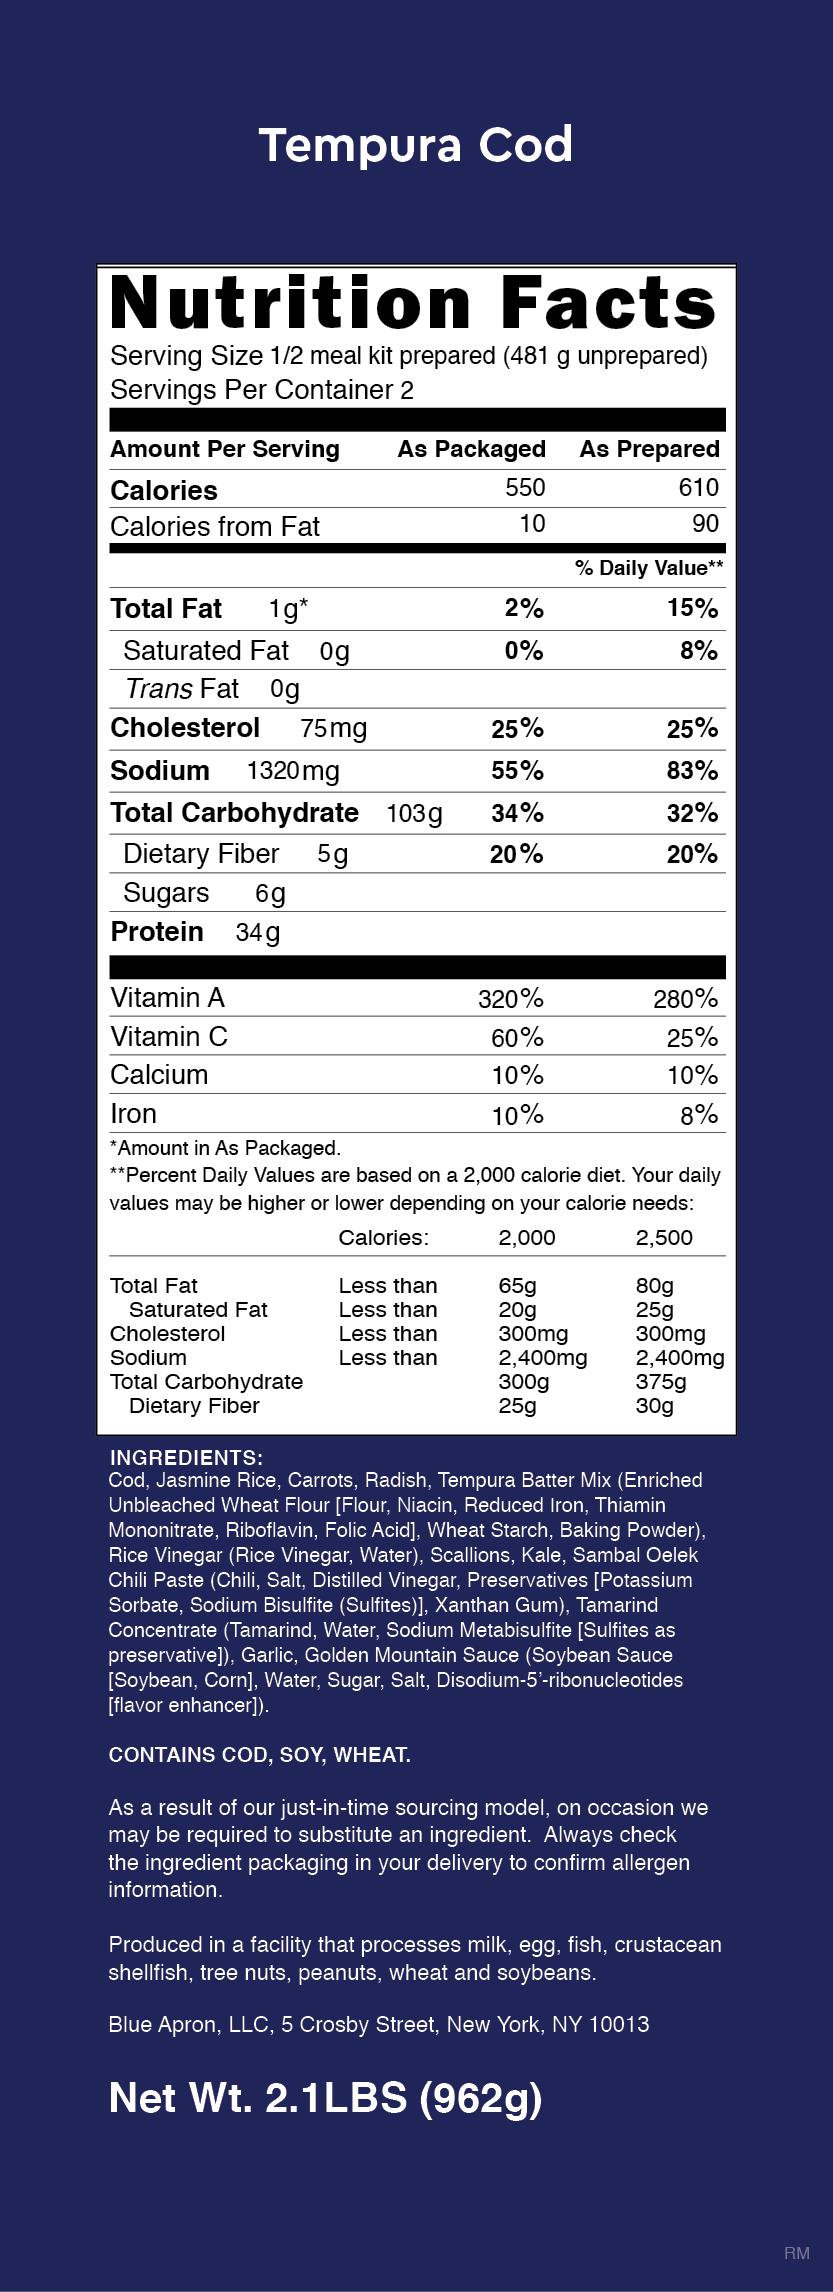 Blue apron tempura cod - Nutrition Label